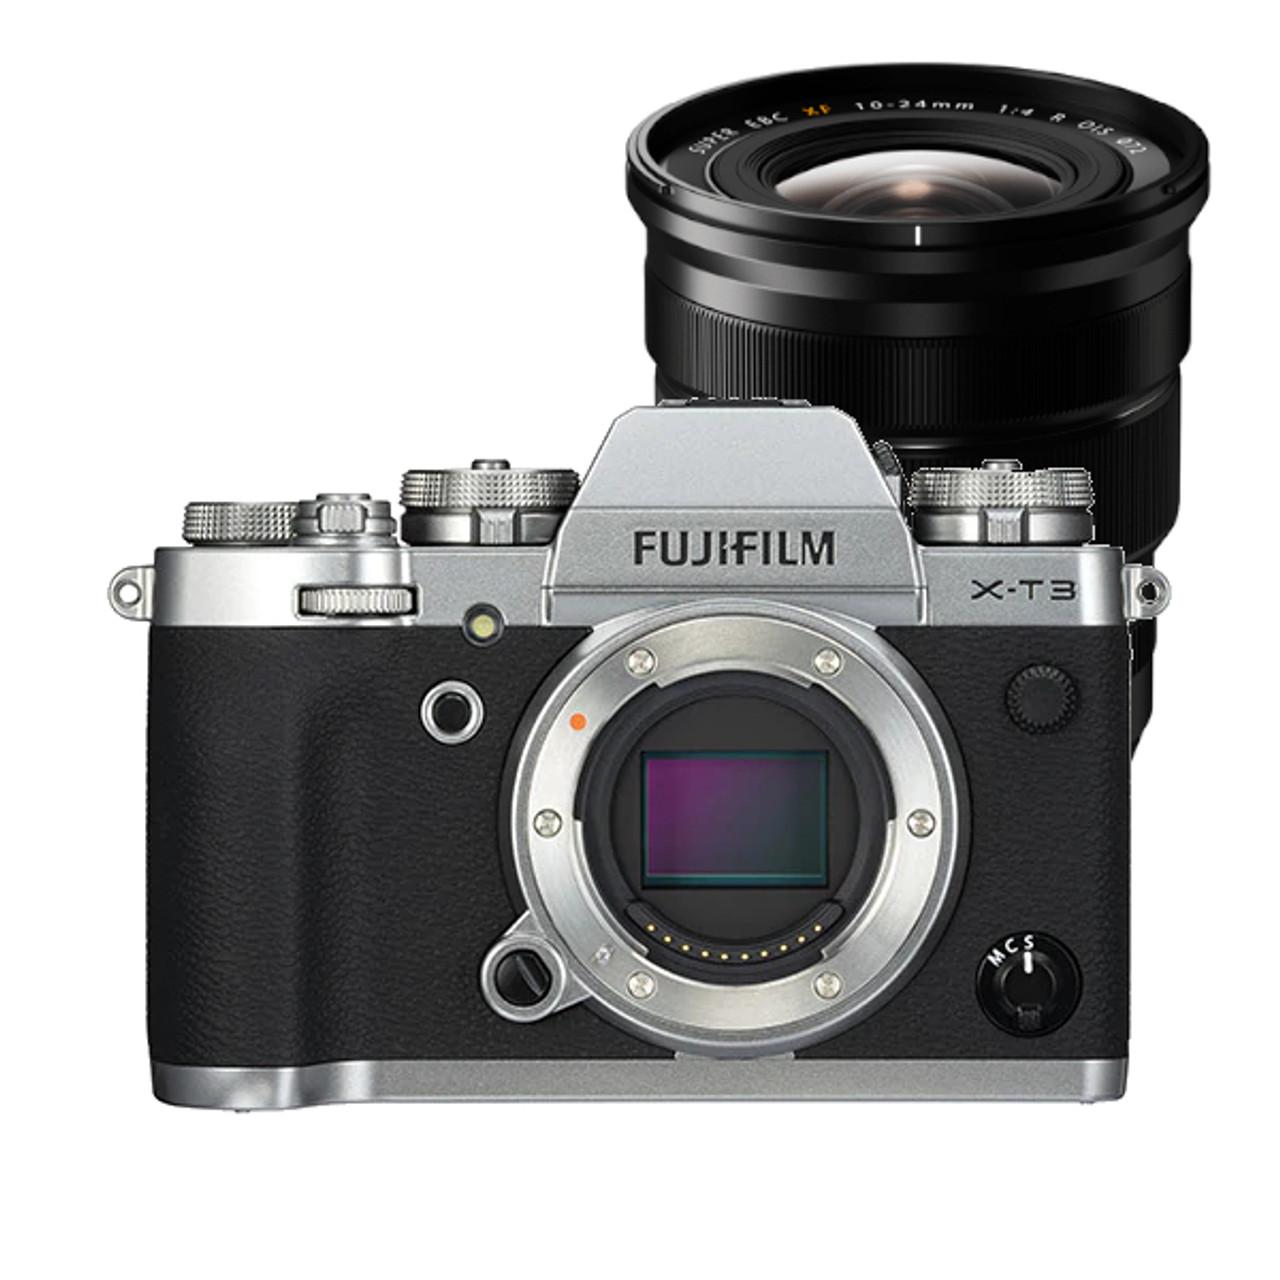 Fujifilm X-T3 Body (Silver) w/ XF 10-24mm f4